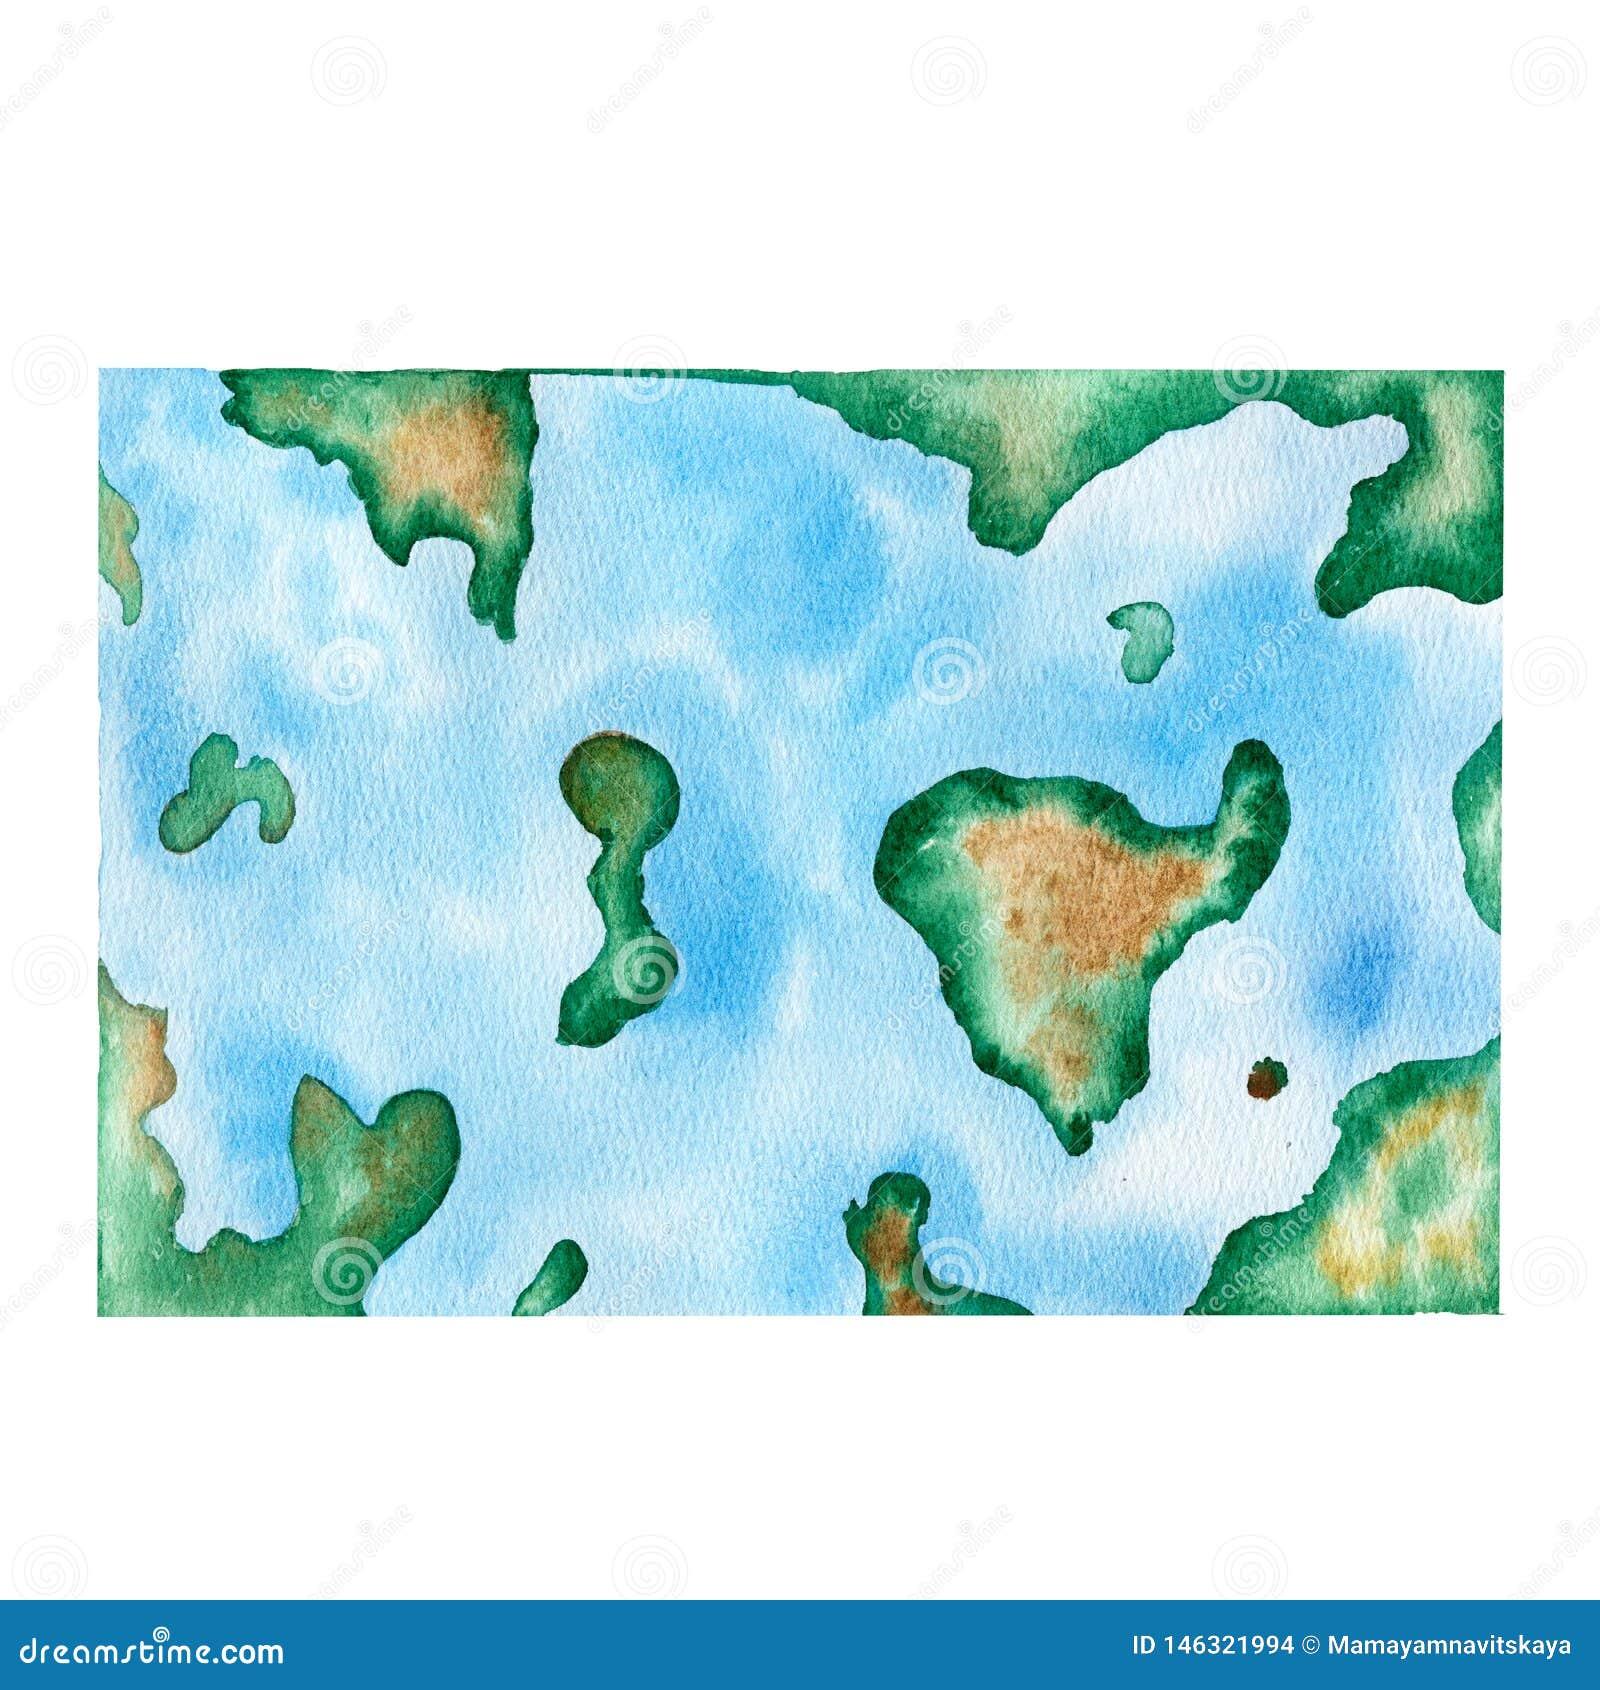 Handgezogene Aquarell-Weltkarteillustration